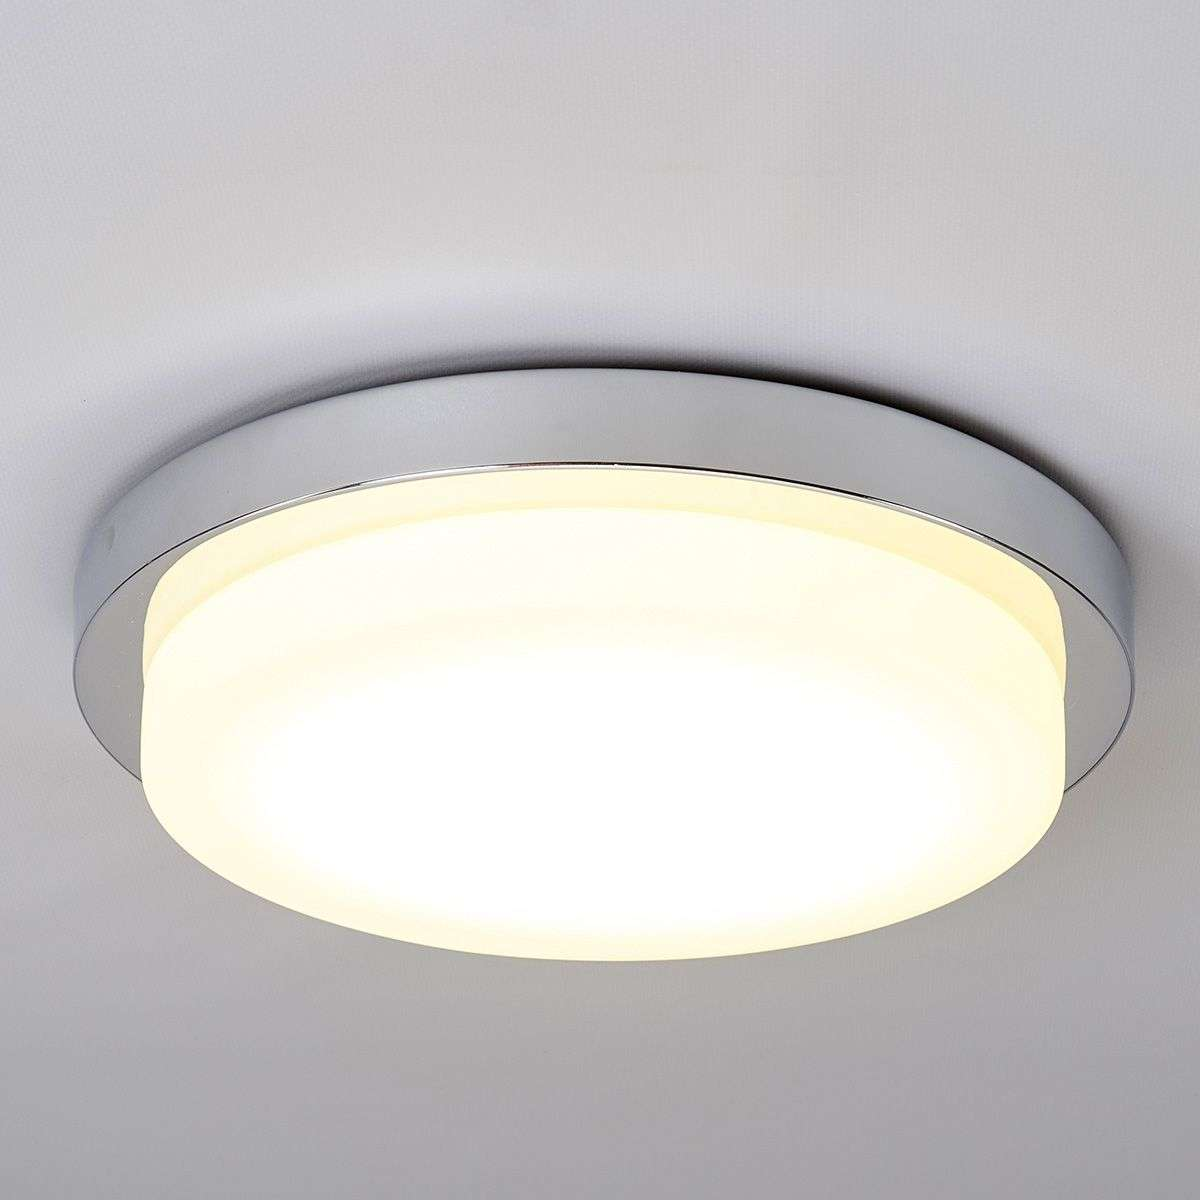 Adriano led bathroom ceiling light lights adriano led bathroom ceiling light mozeypictures Choice Image